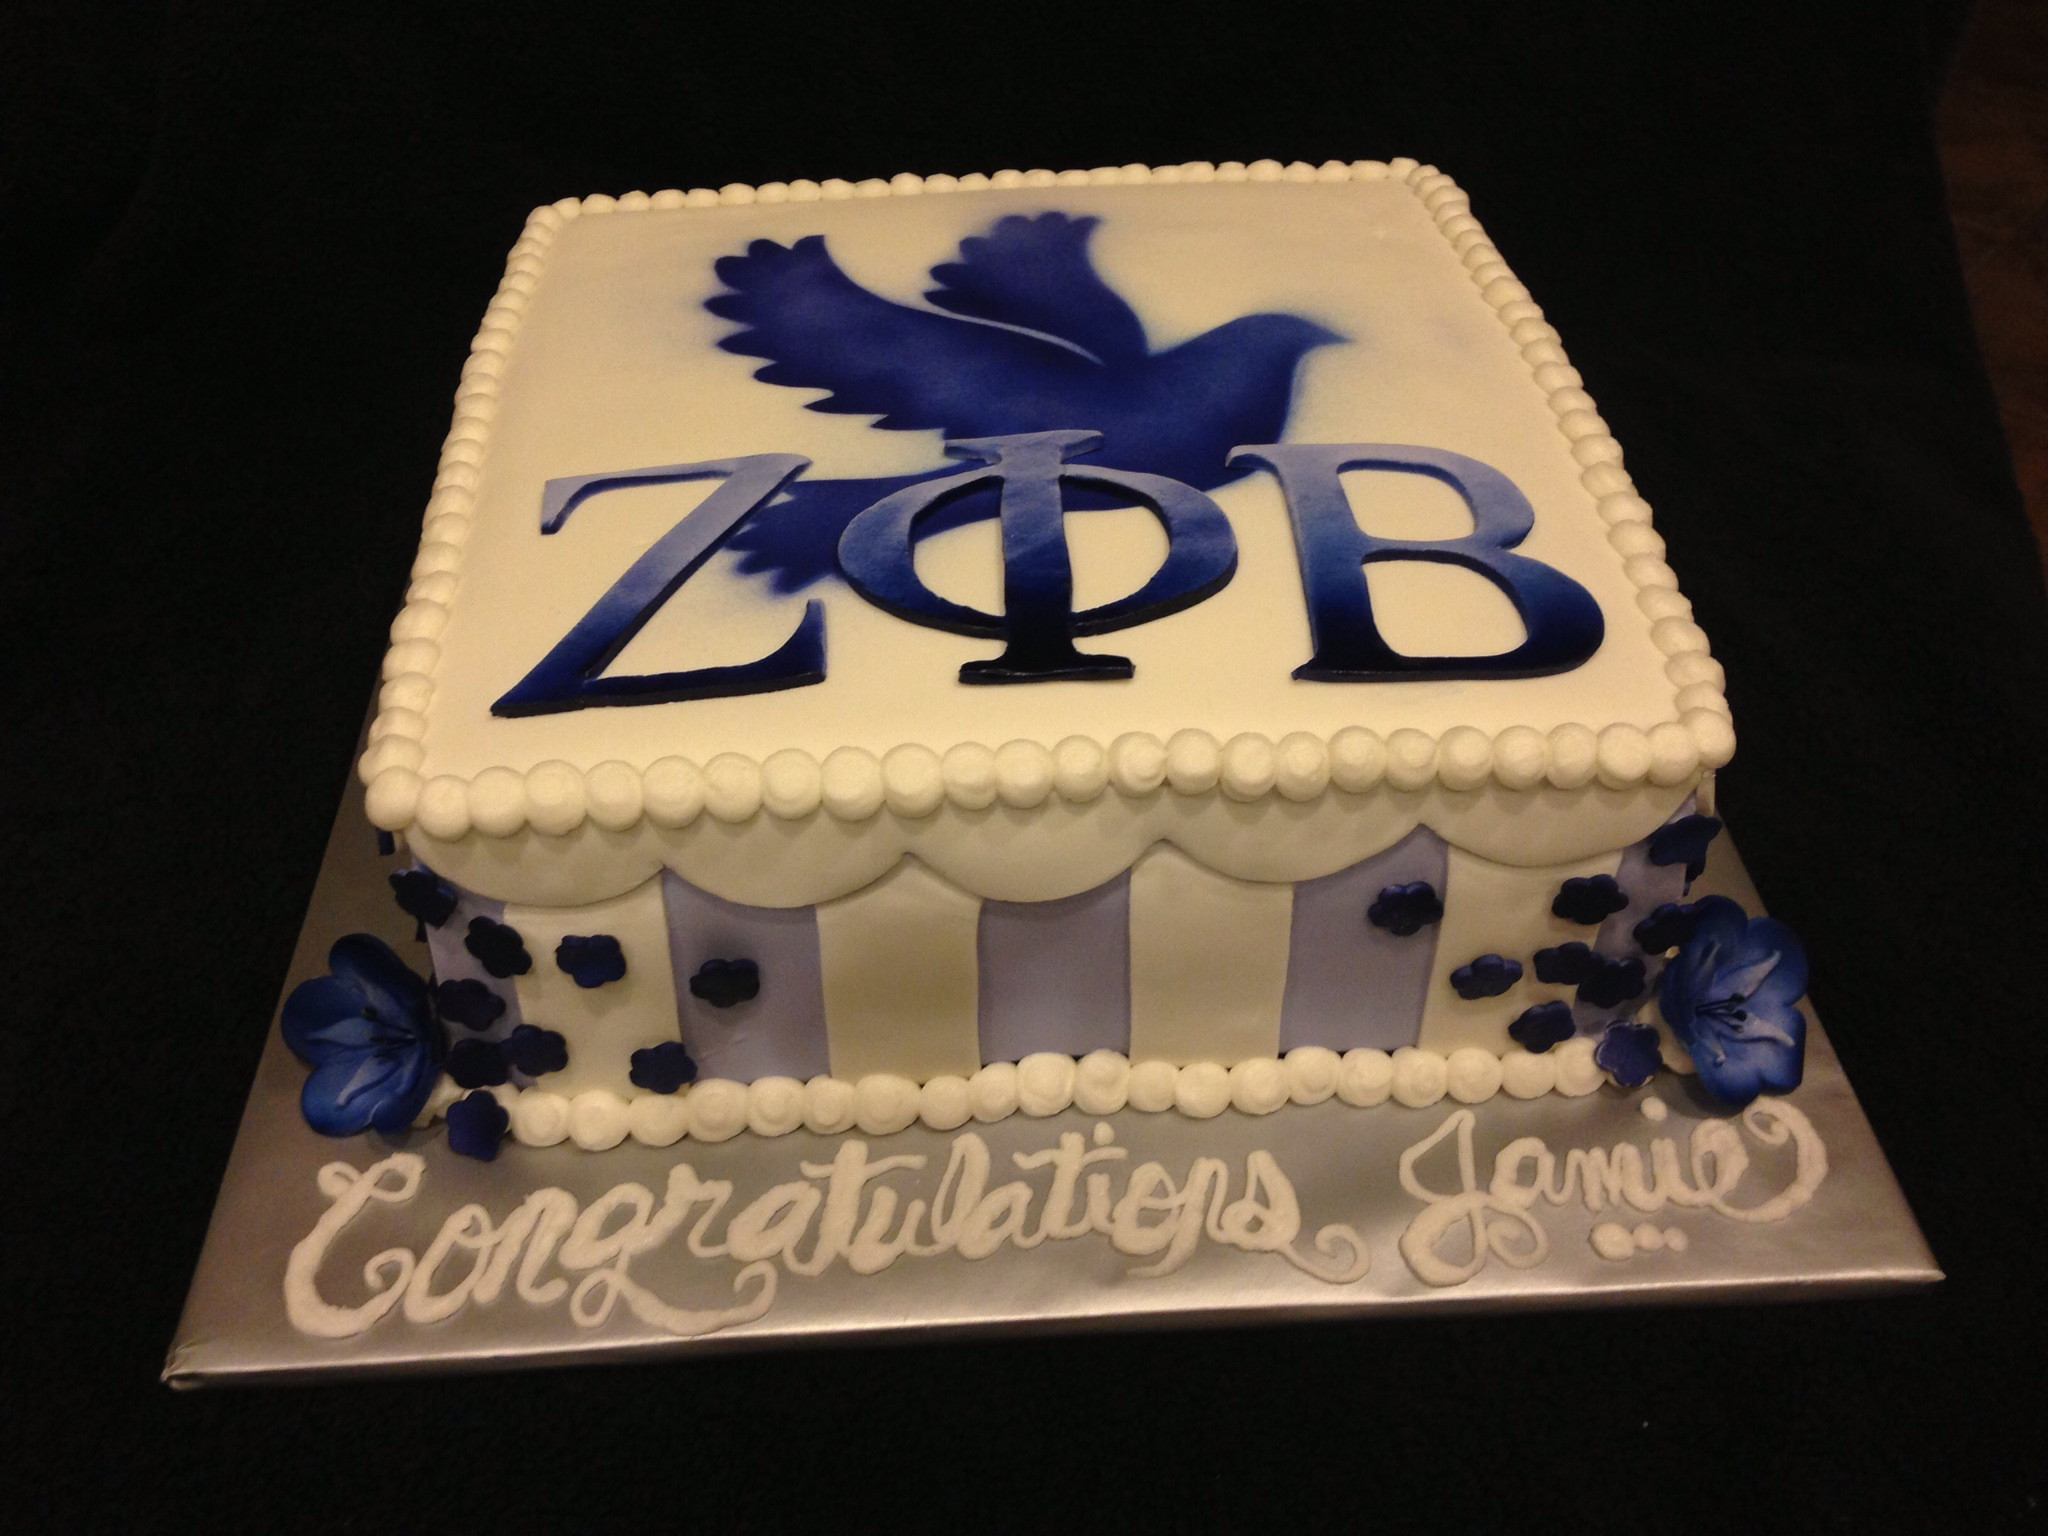 Zeta Phi Beta cake